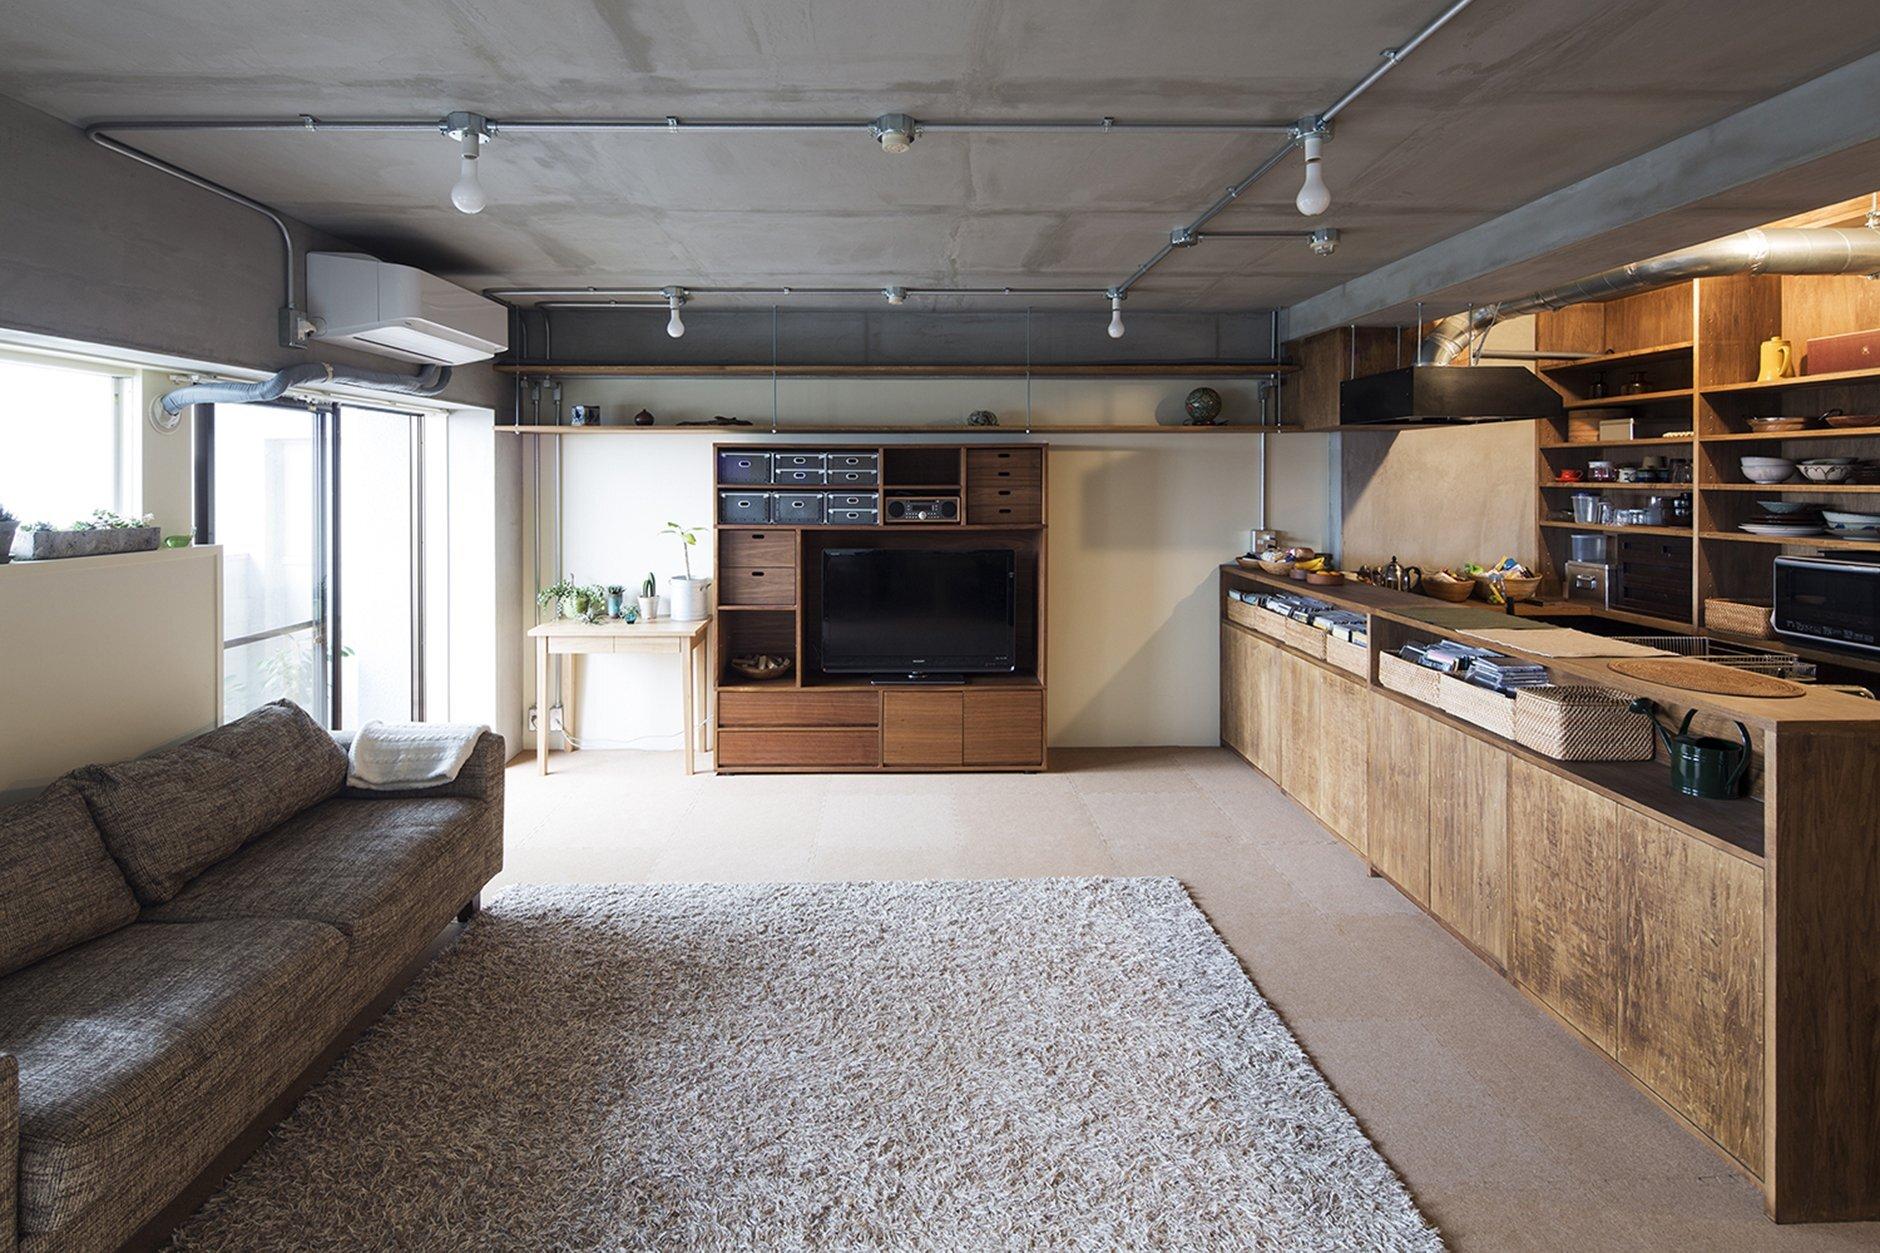 A Dark Industrial Chic Apartment From Tokyo By Yuichi Yoshida